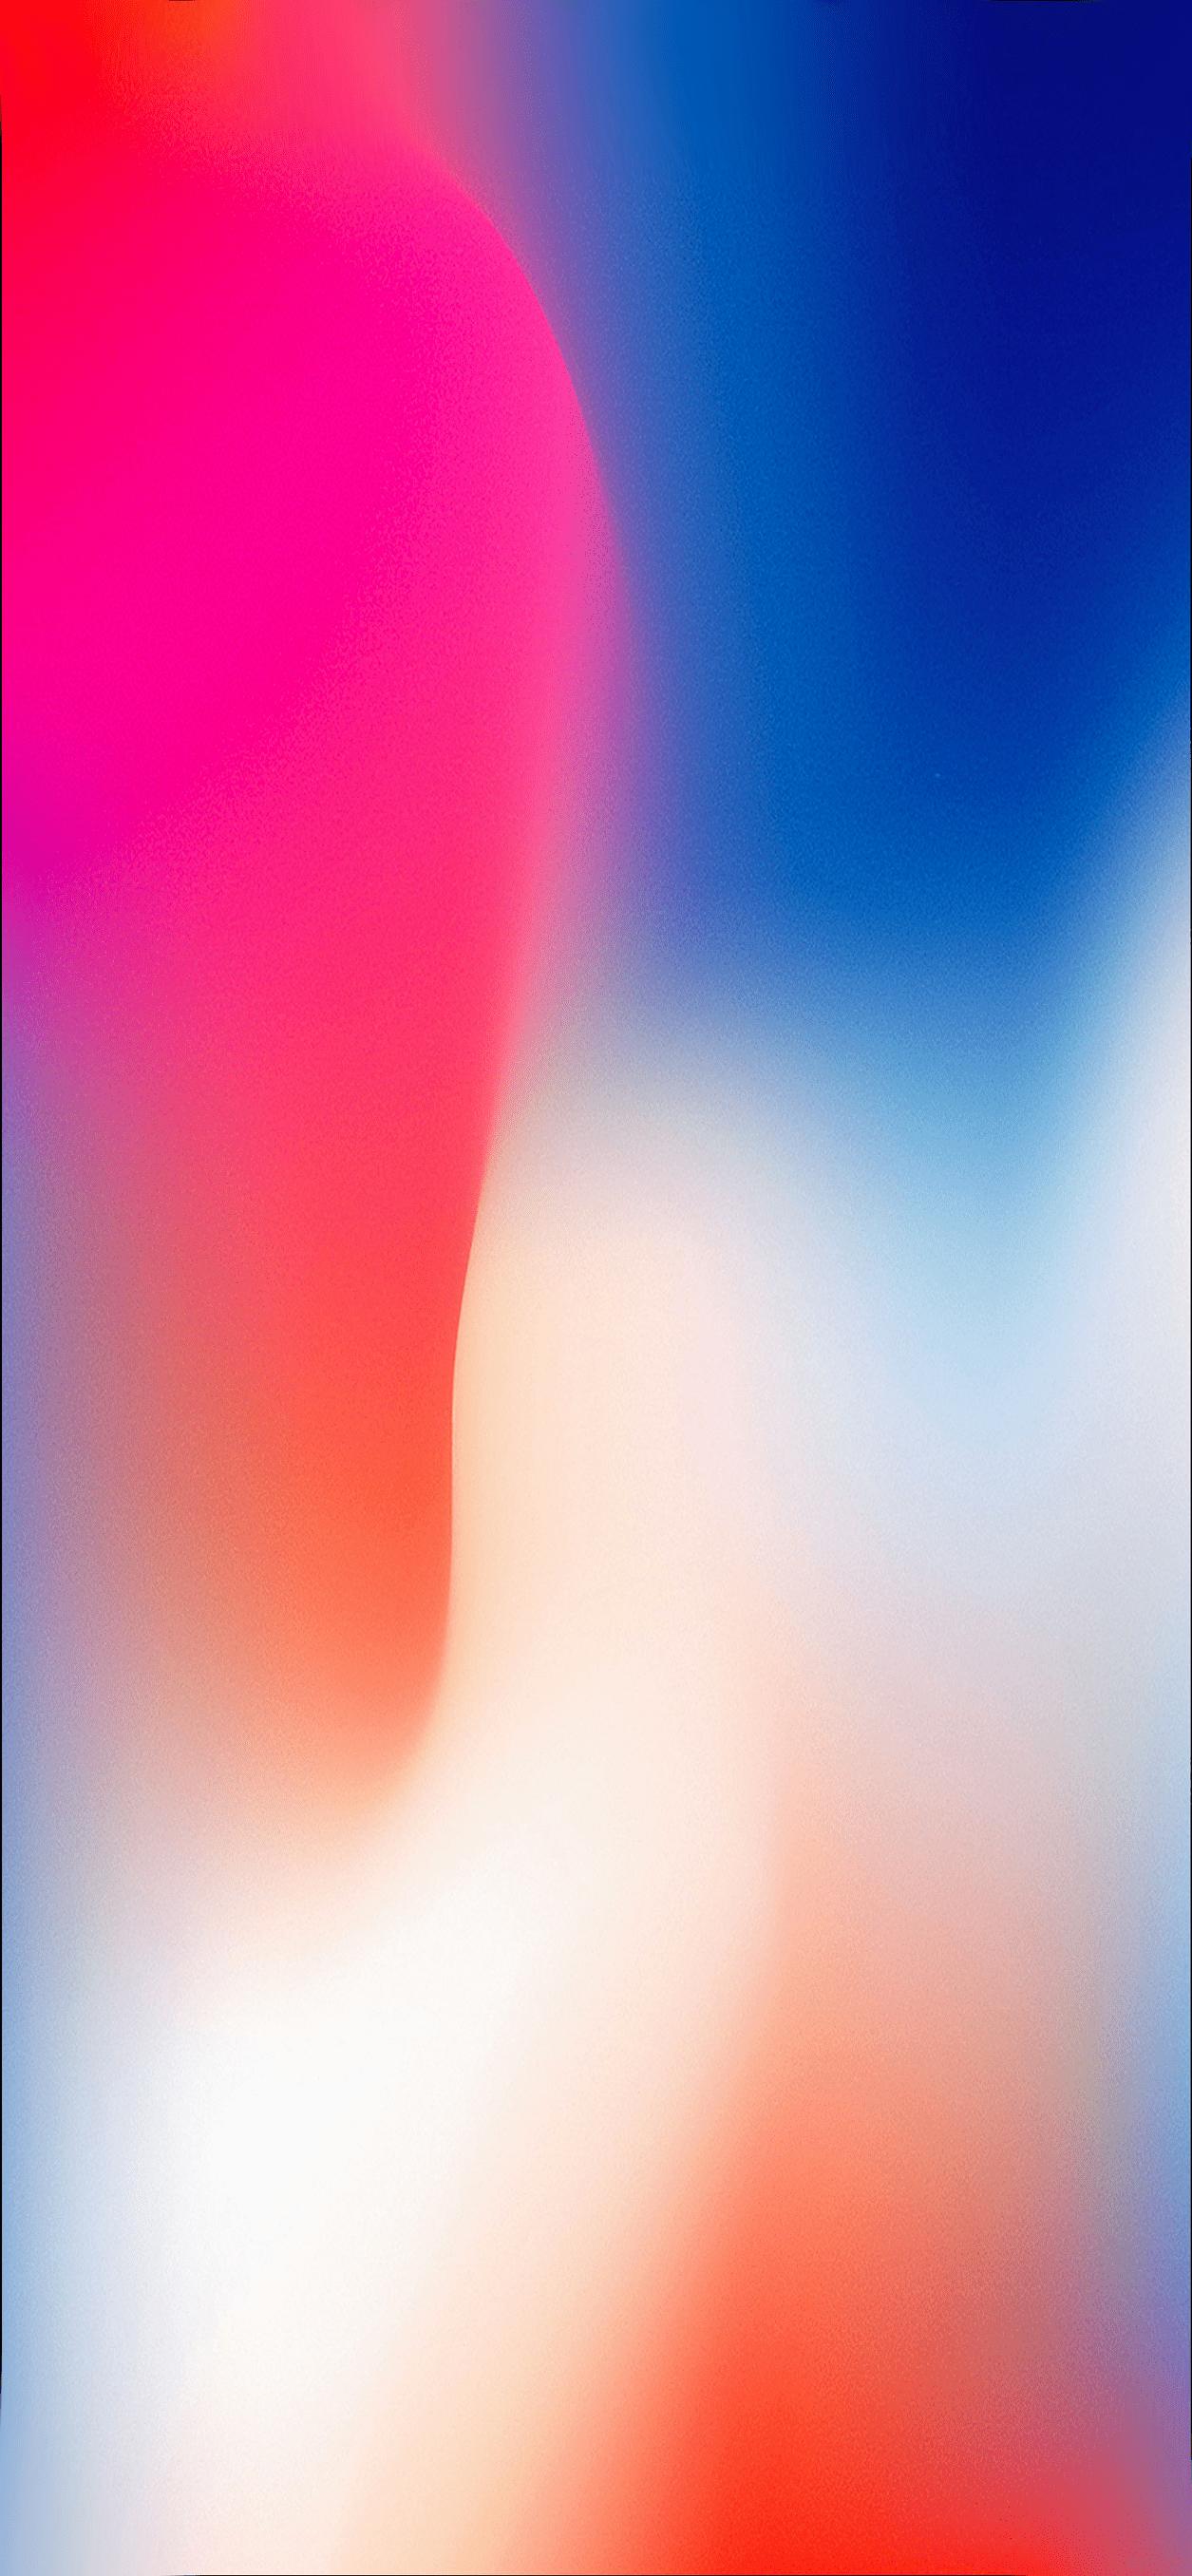 iPhone X Wallpapers Ios 11 wallpaper, 4k wallpaper